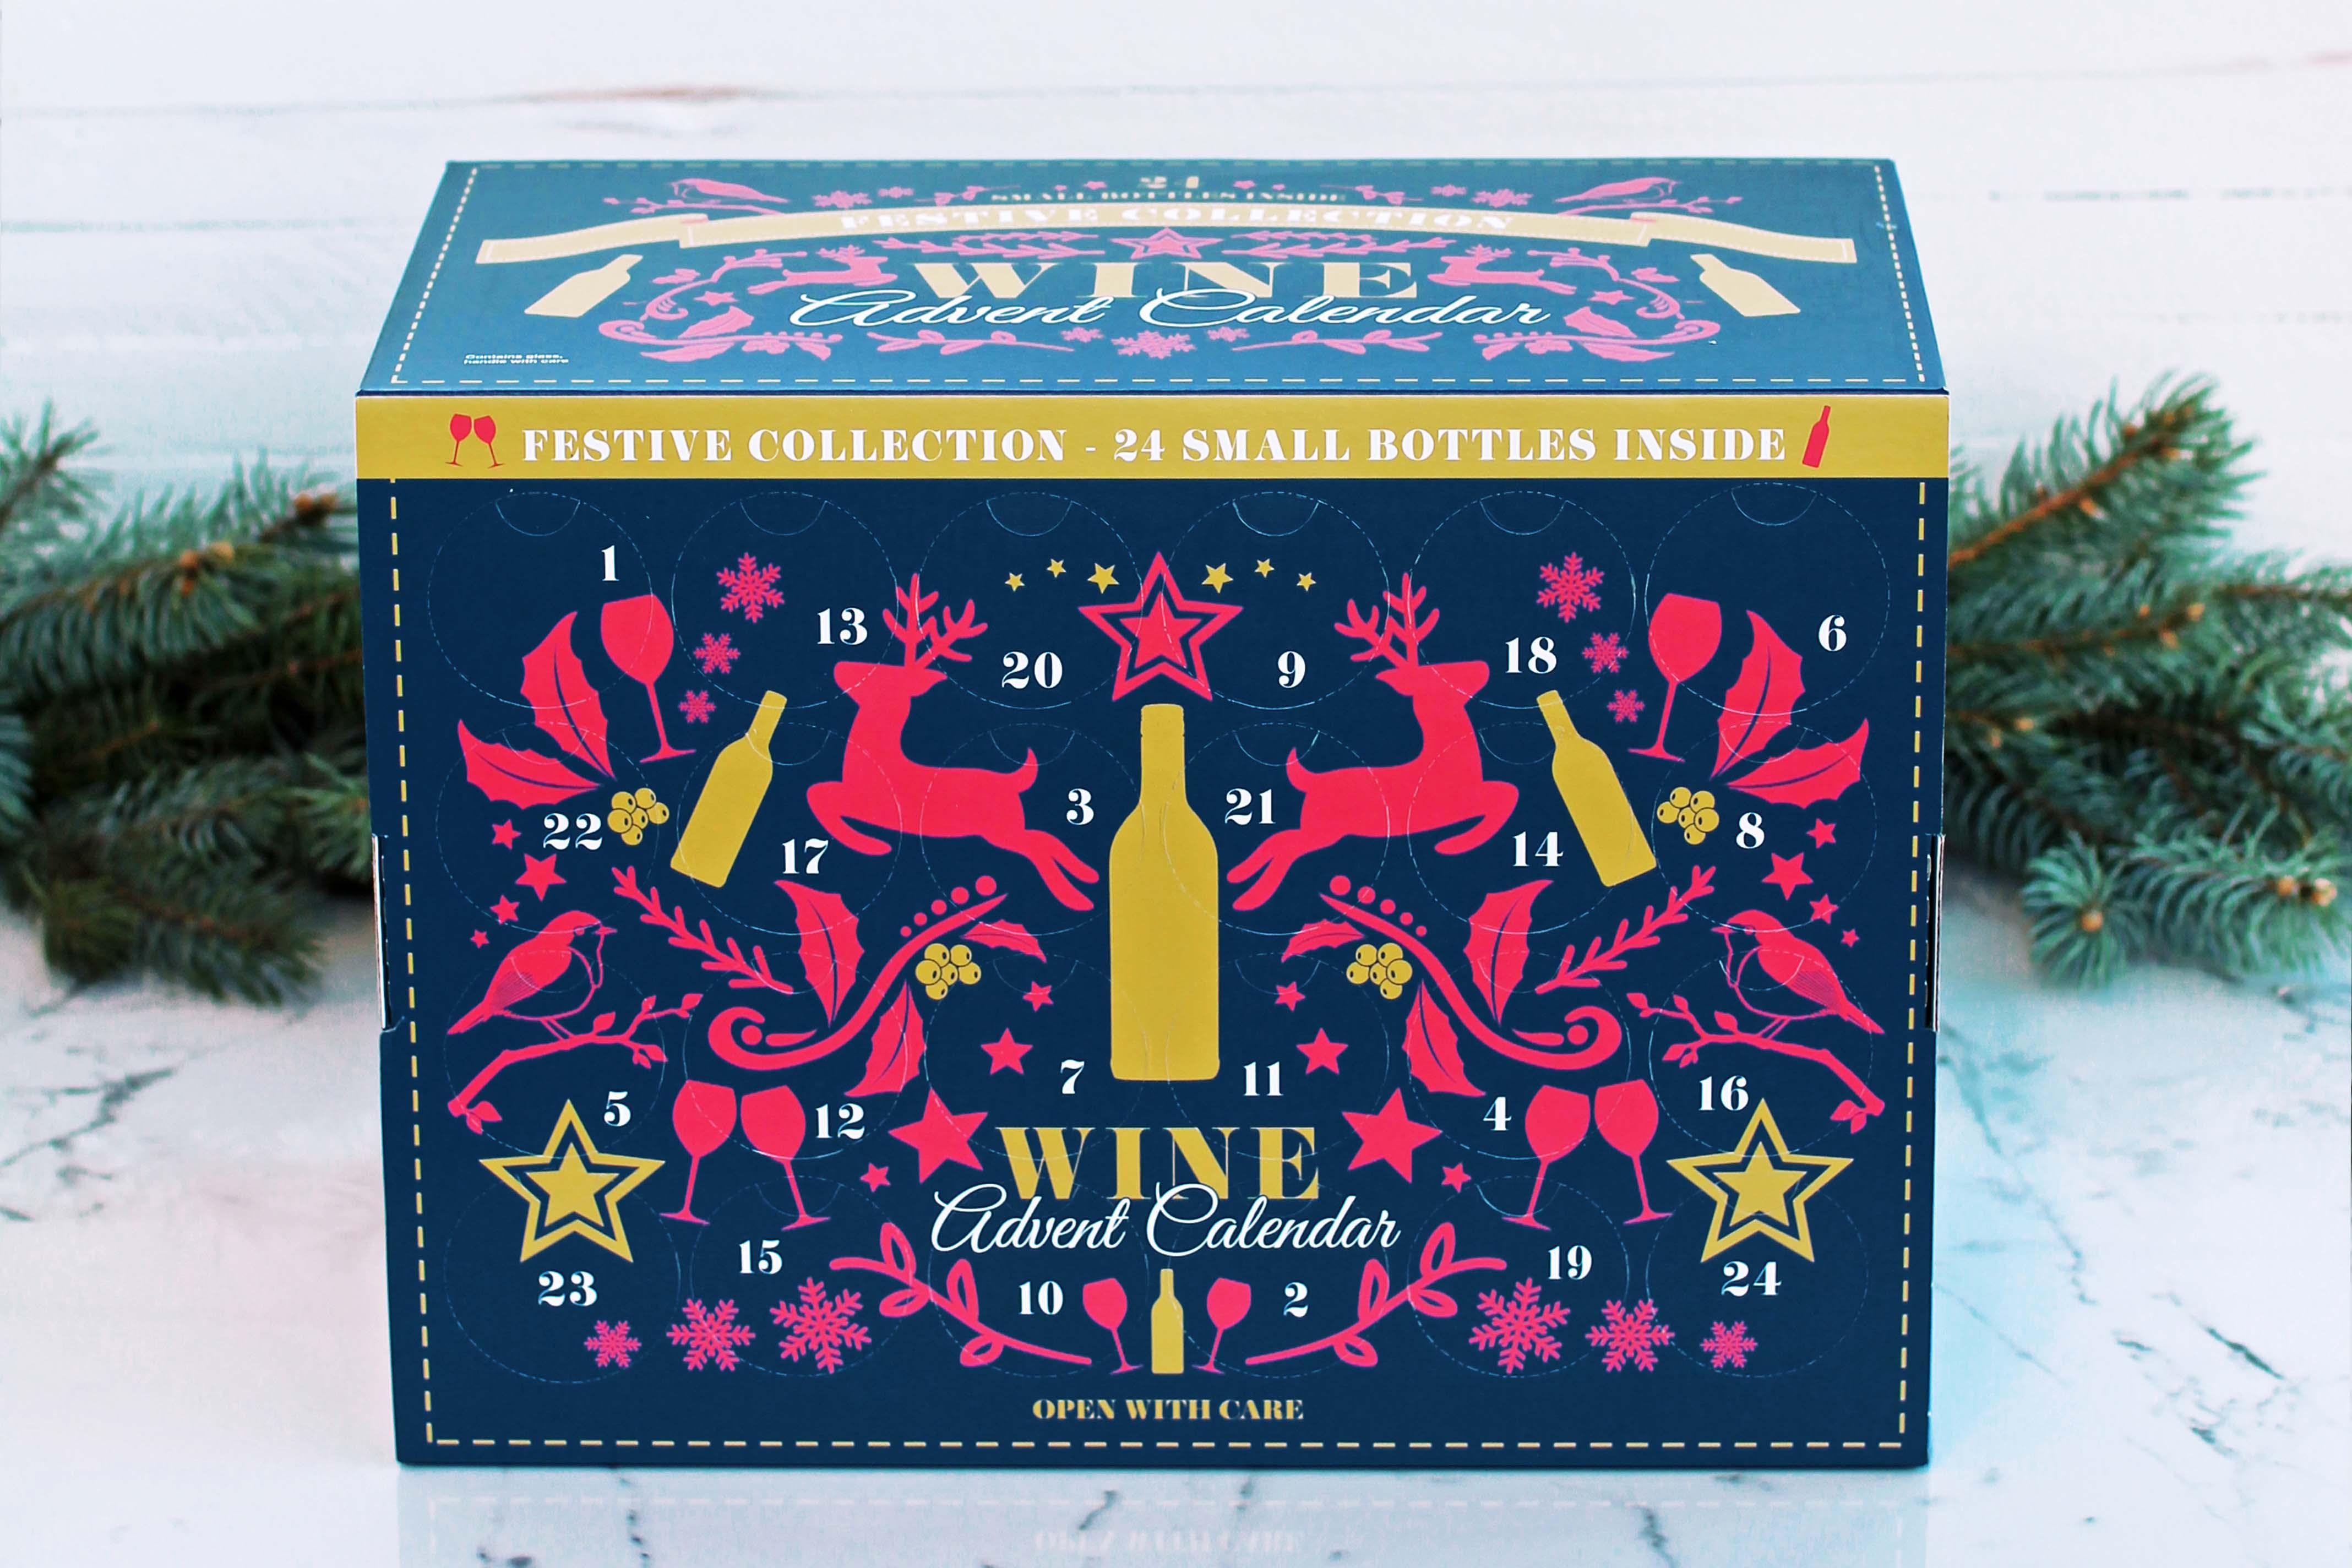 Wine Advent Calendar 2020 Usa Advent Calendars Are Here! | ALDI Blog